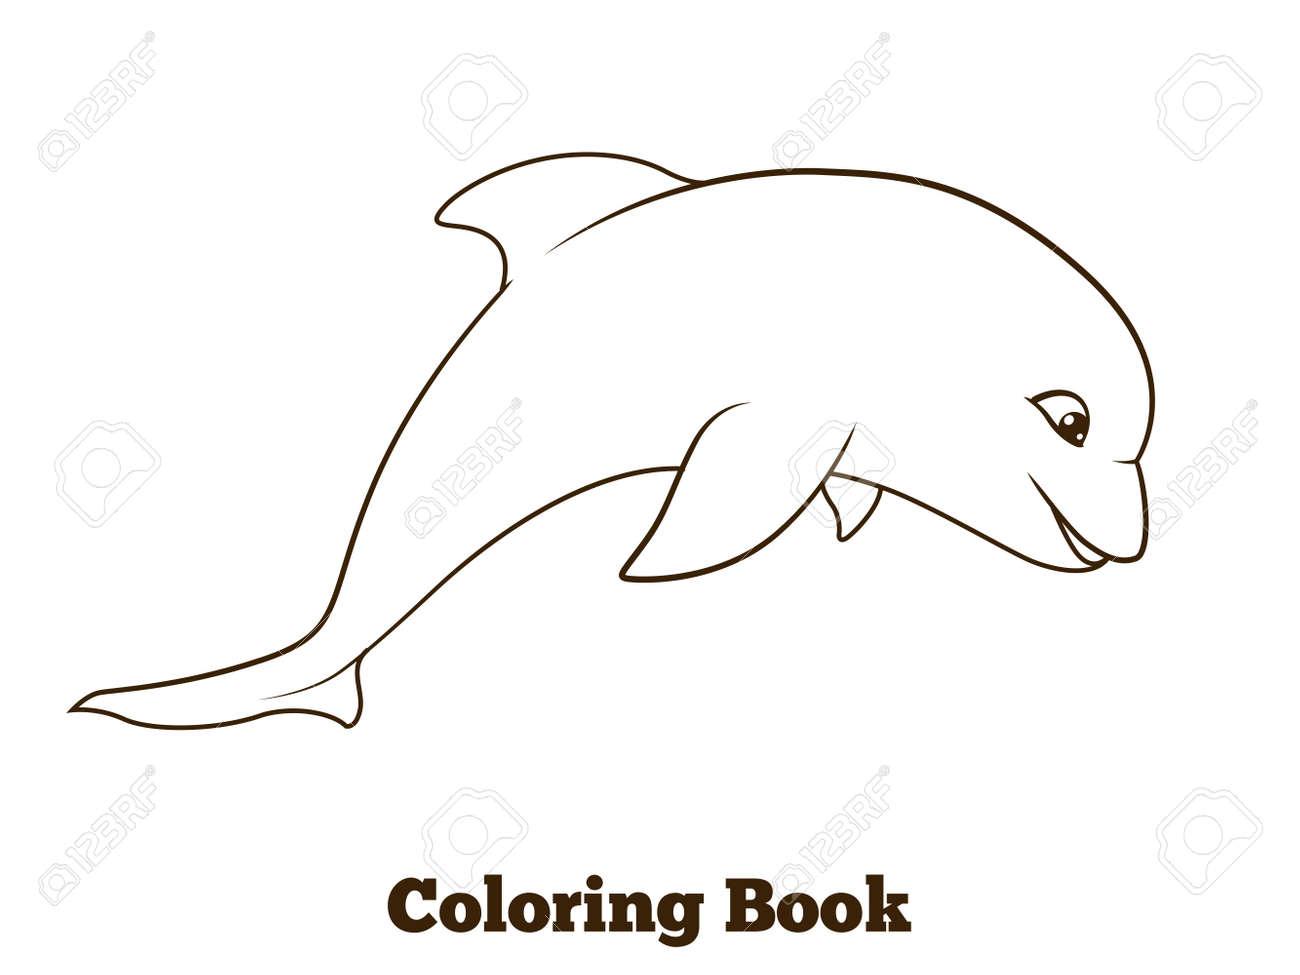 Coloriage Crabe Dauphin.Livre De Coloriage Dessin Anime Dauphin Vecteur Educatif